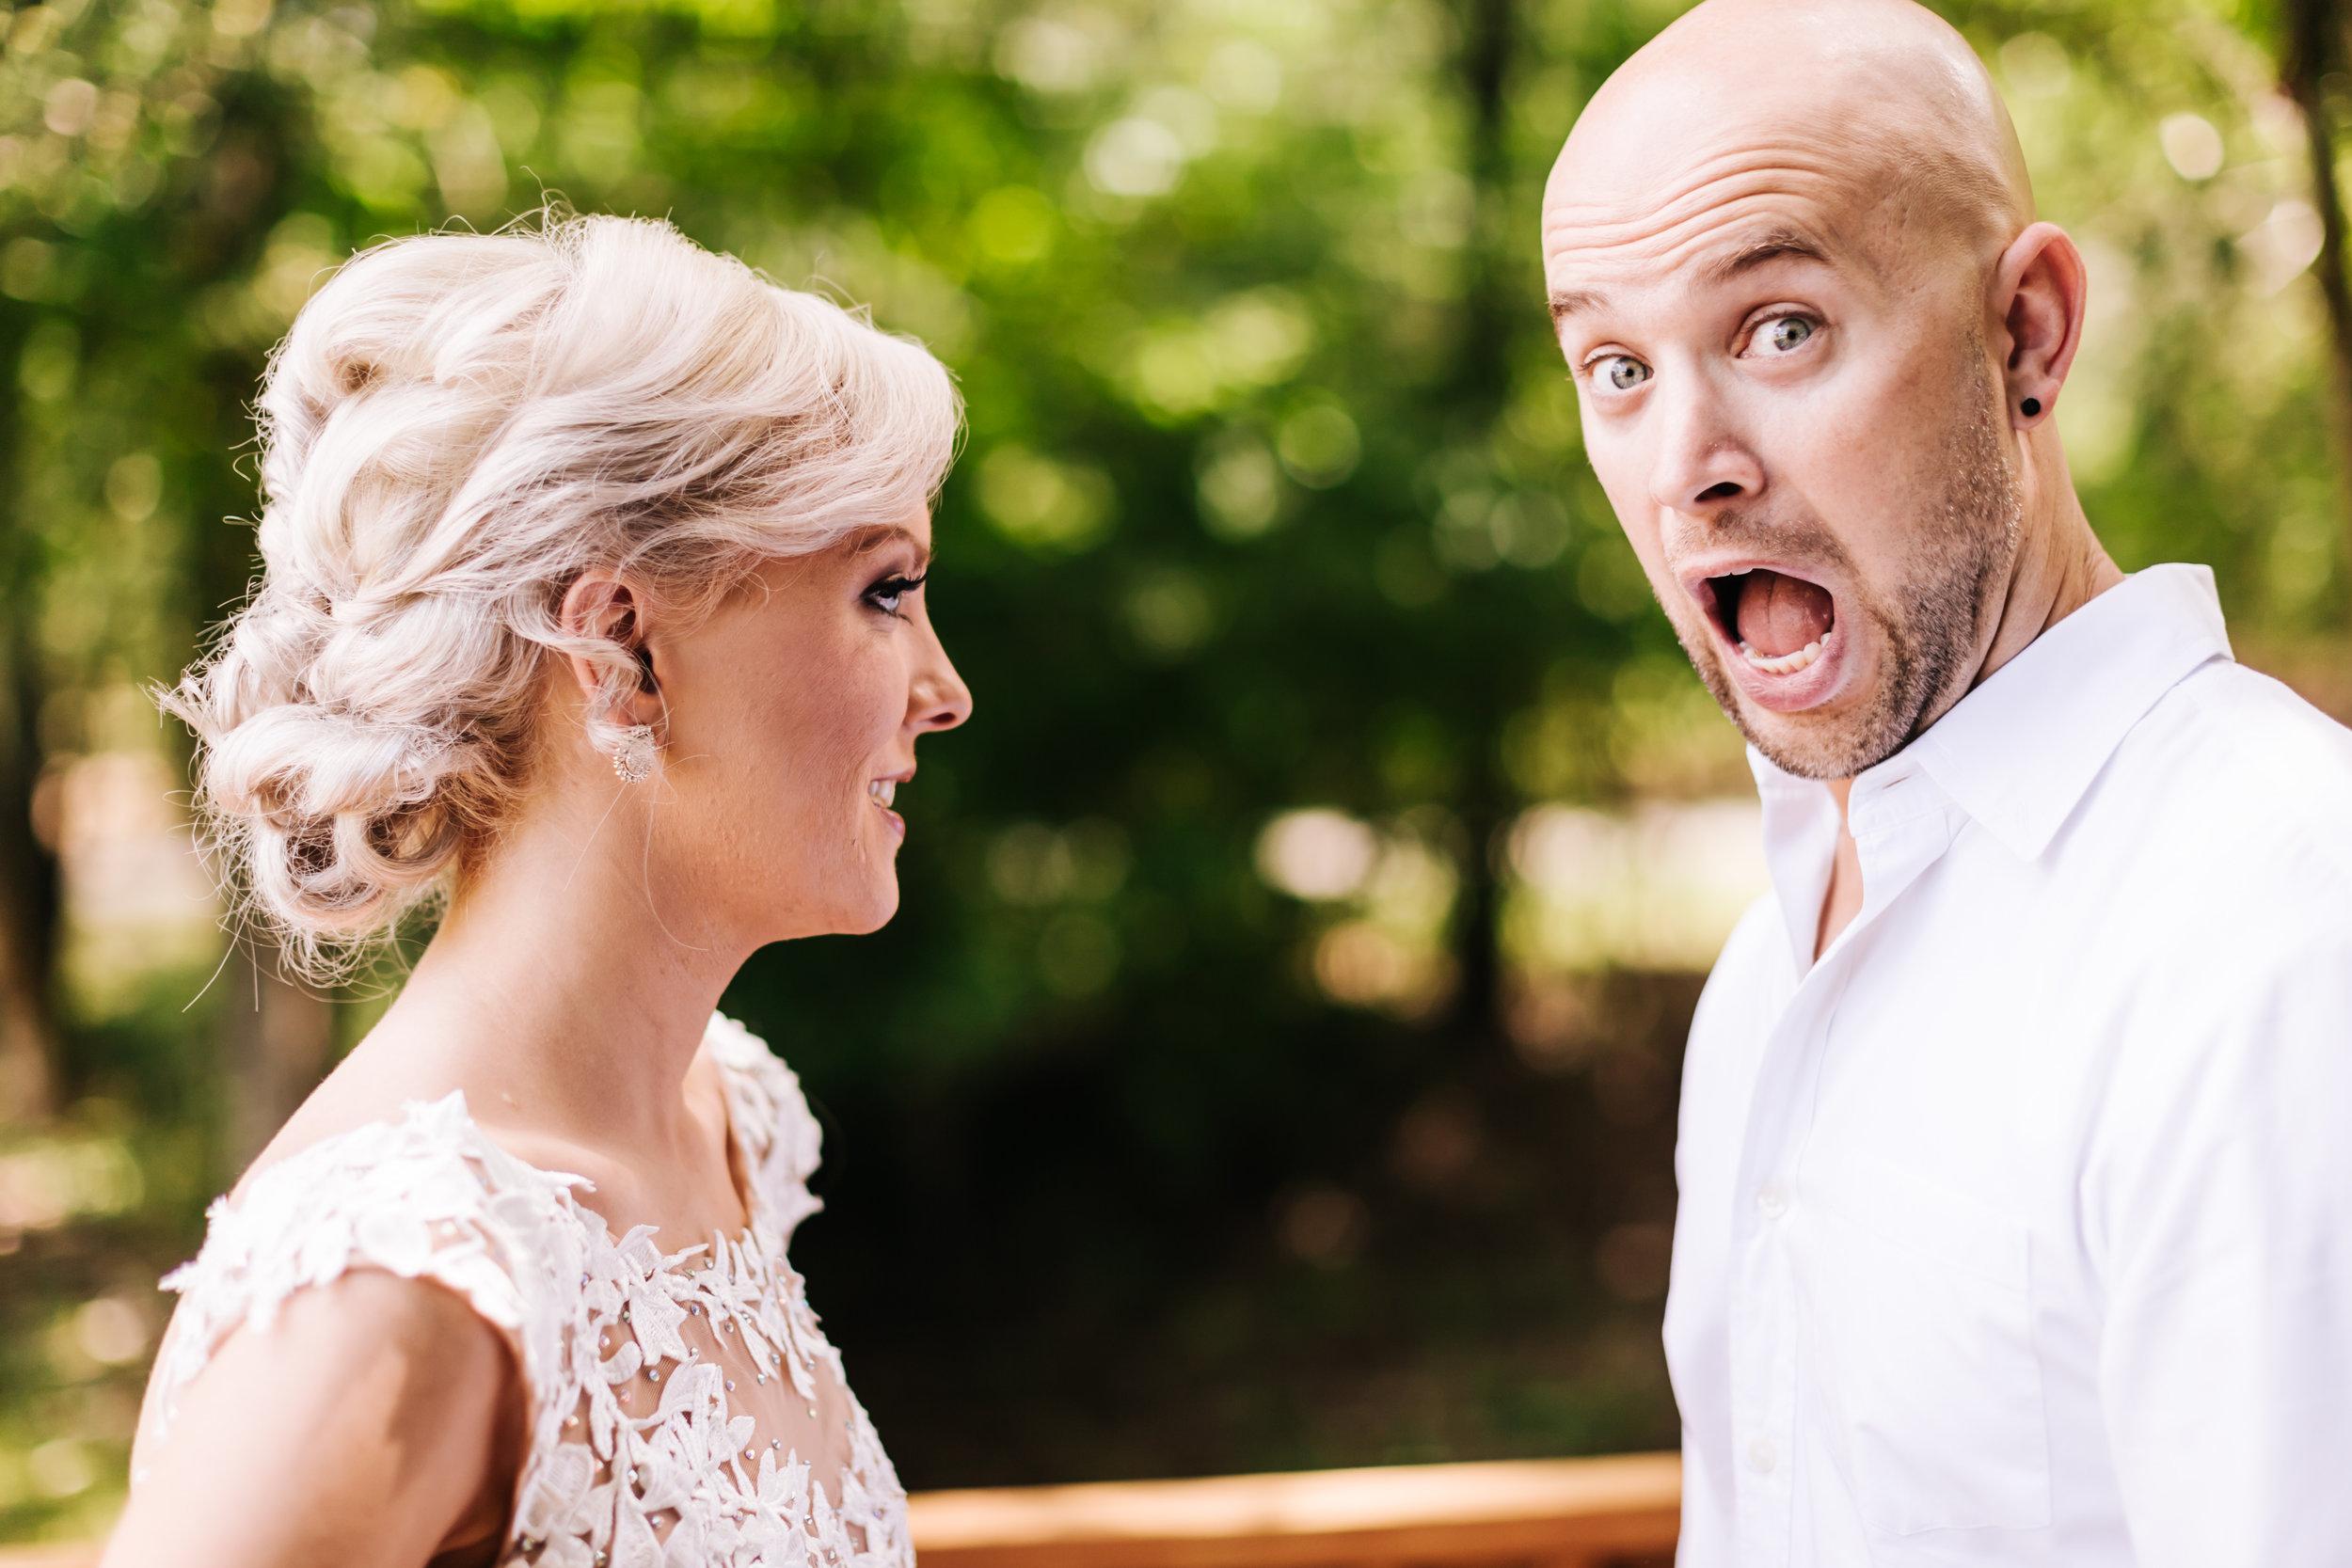 2018.09.02 Ray and Sarah Prizner Nashville TN Wedding FINALS-78.jpg